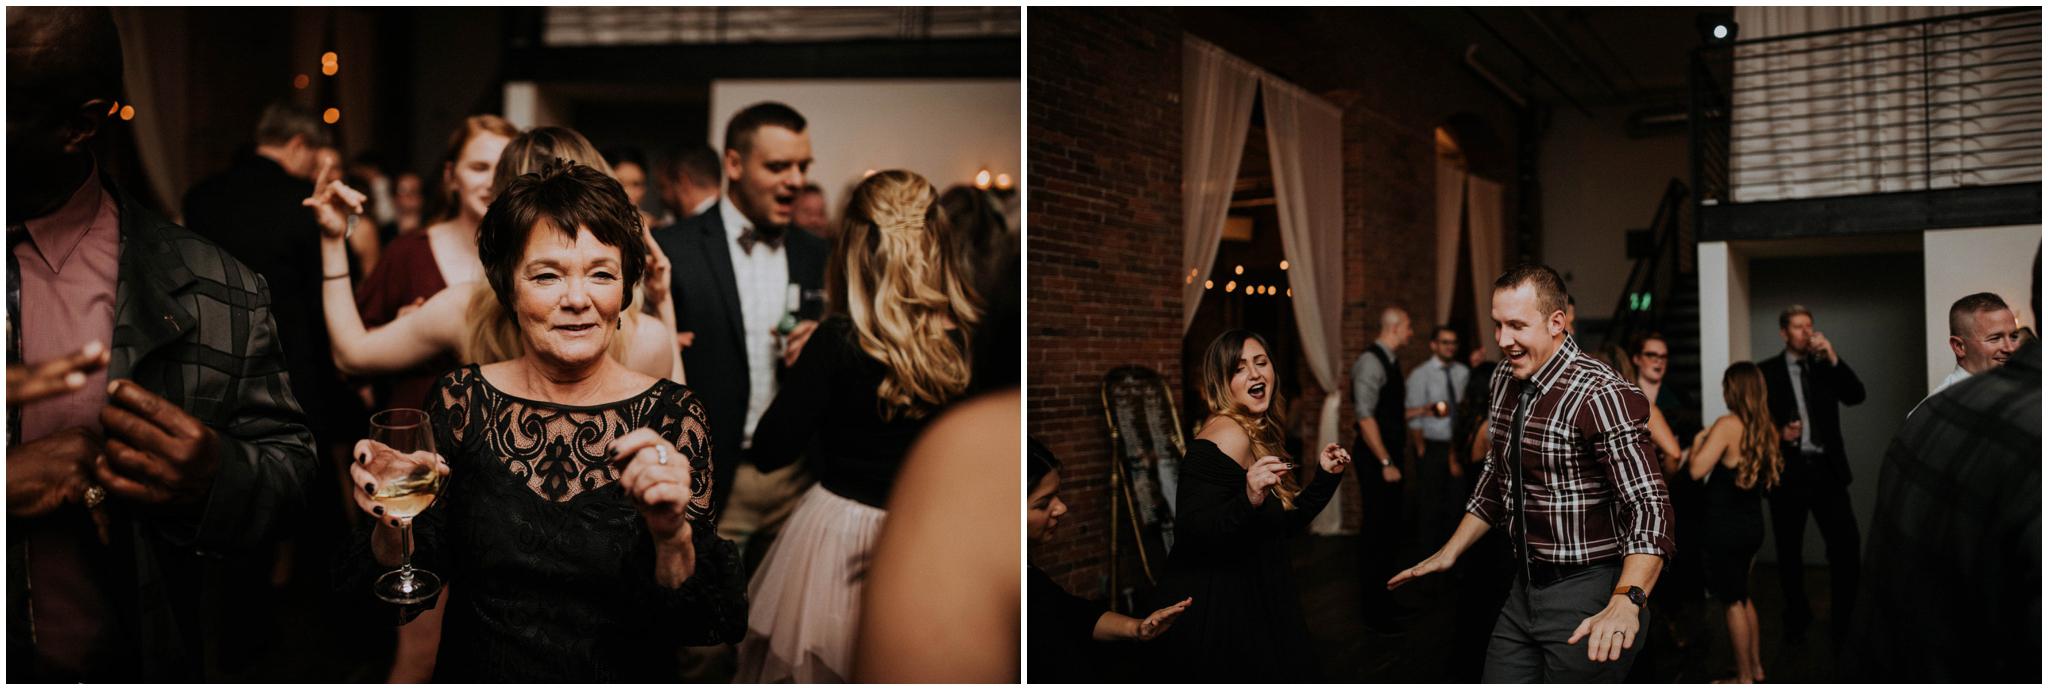 danny+mackenzie+downtown-seattle-axis-wedding-seattle-photographer-115.jpg